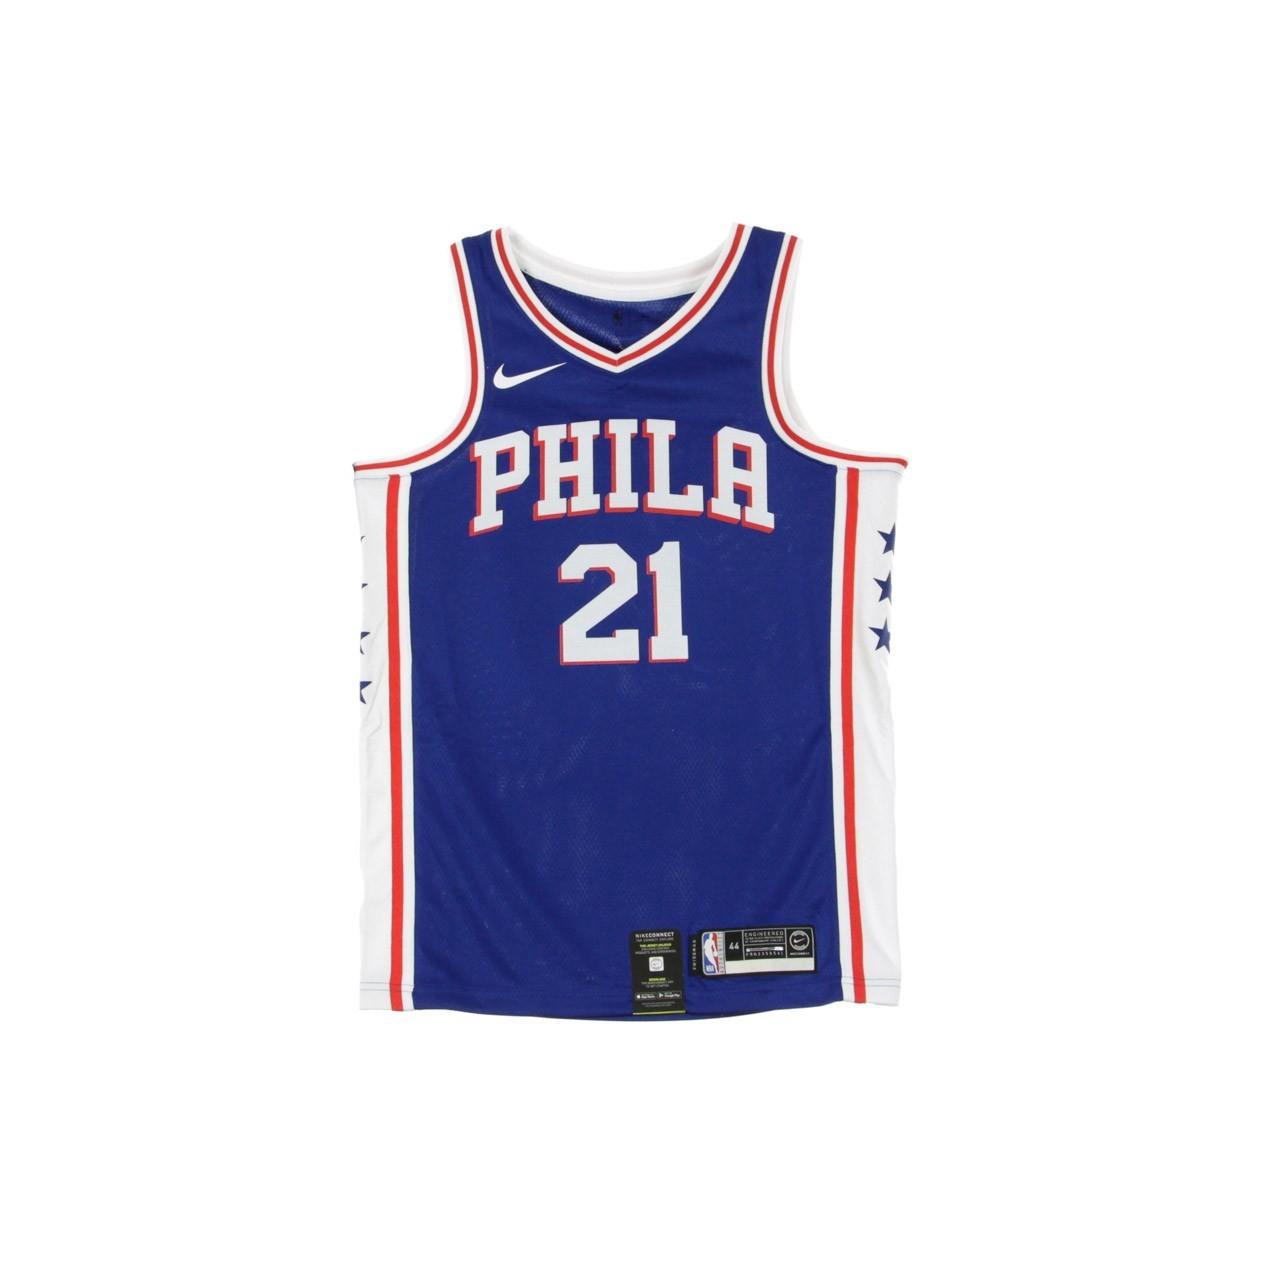 NIKE NBA NBA SWINGMAN JERSEY ICON EDITION NO 21 JOEL EMBIID PHI76E ROAD CJ7678-498